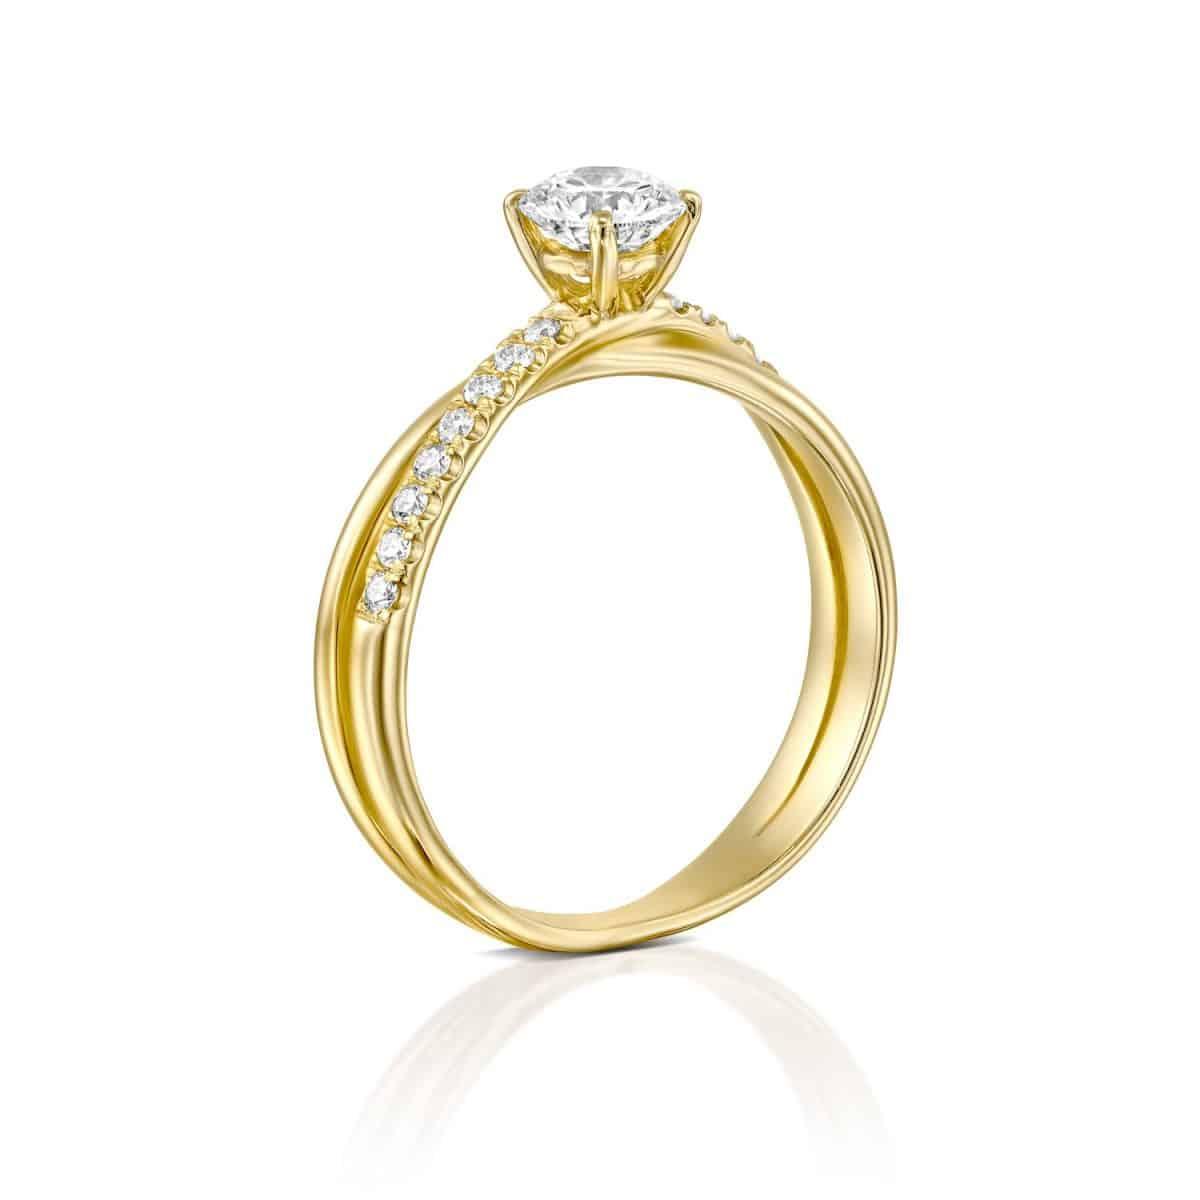 Monique - Twist Yellow Gold Lab Grown Diamond Engagement Ring 0.41ct. - standing